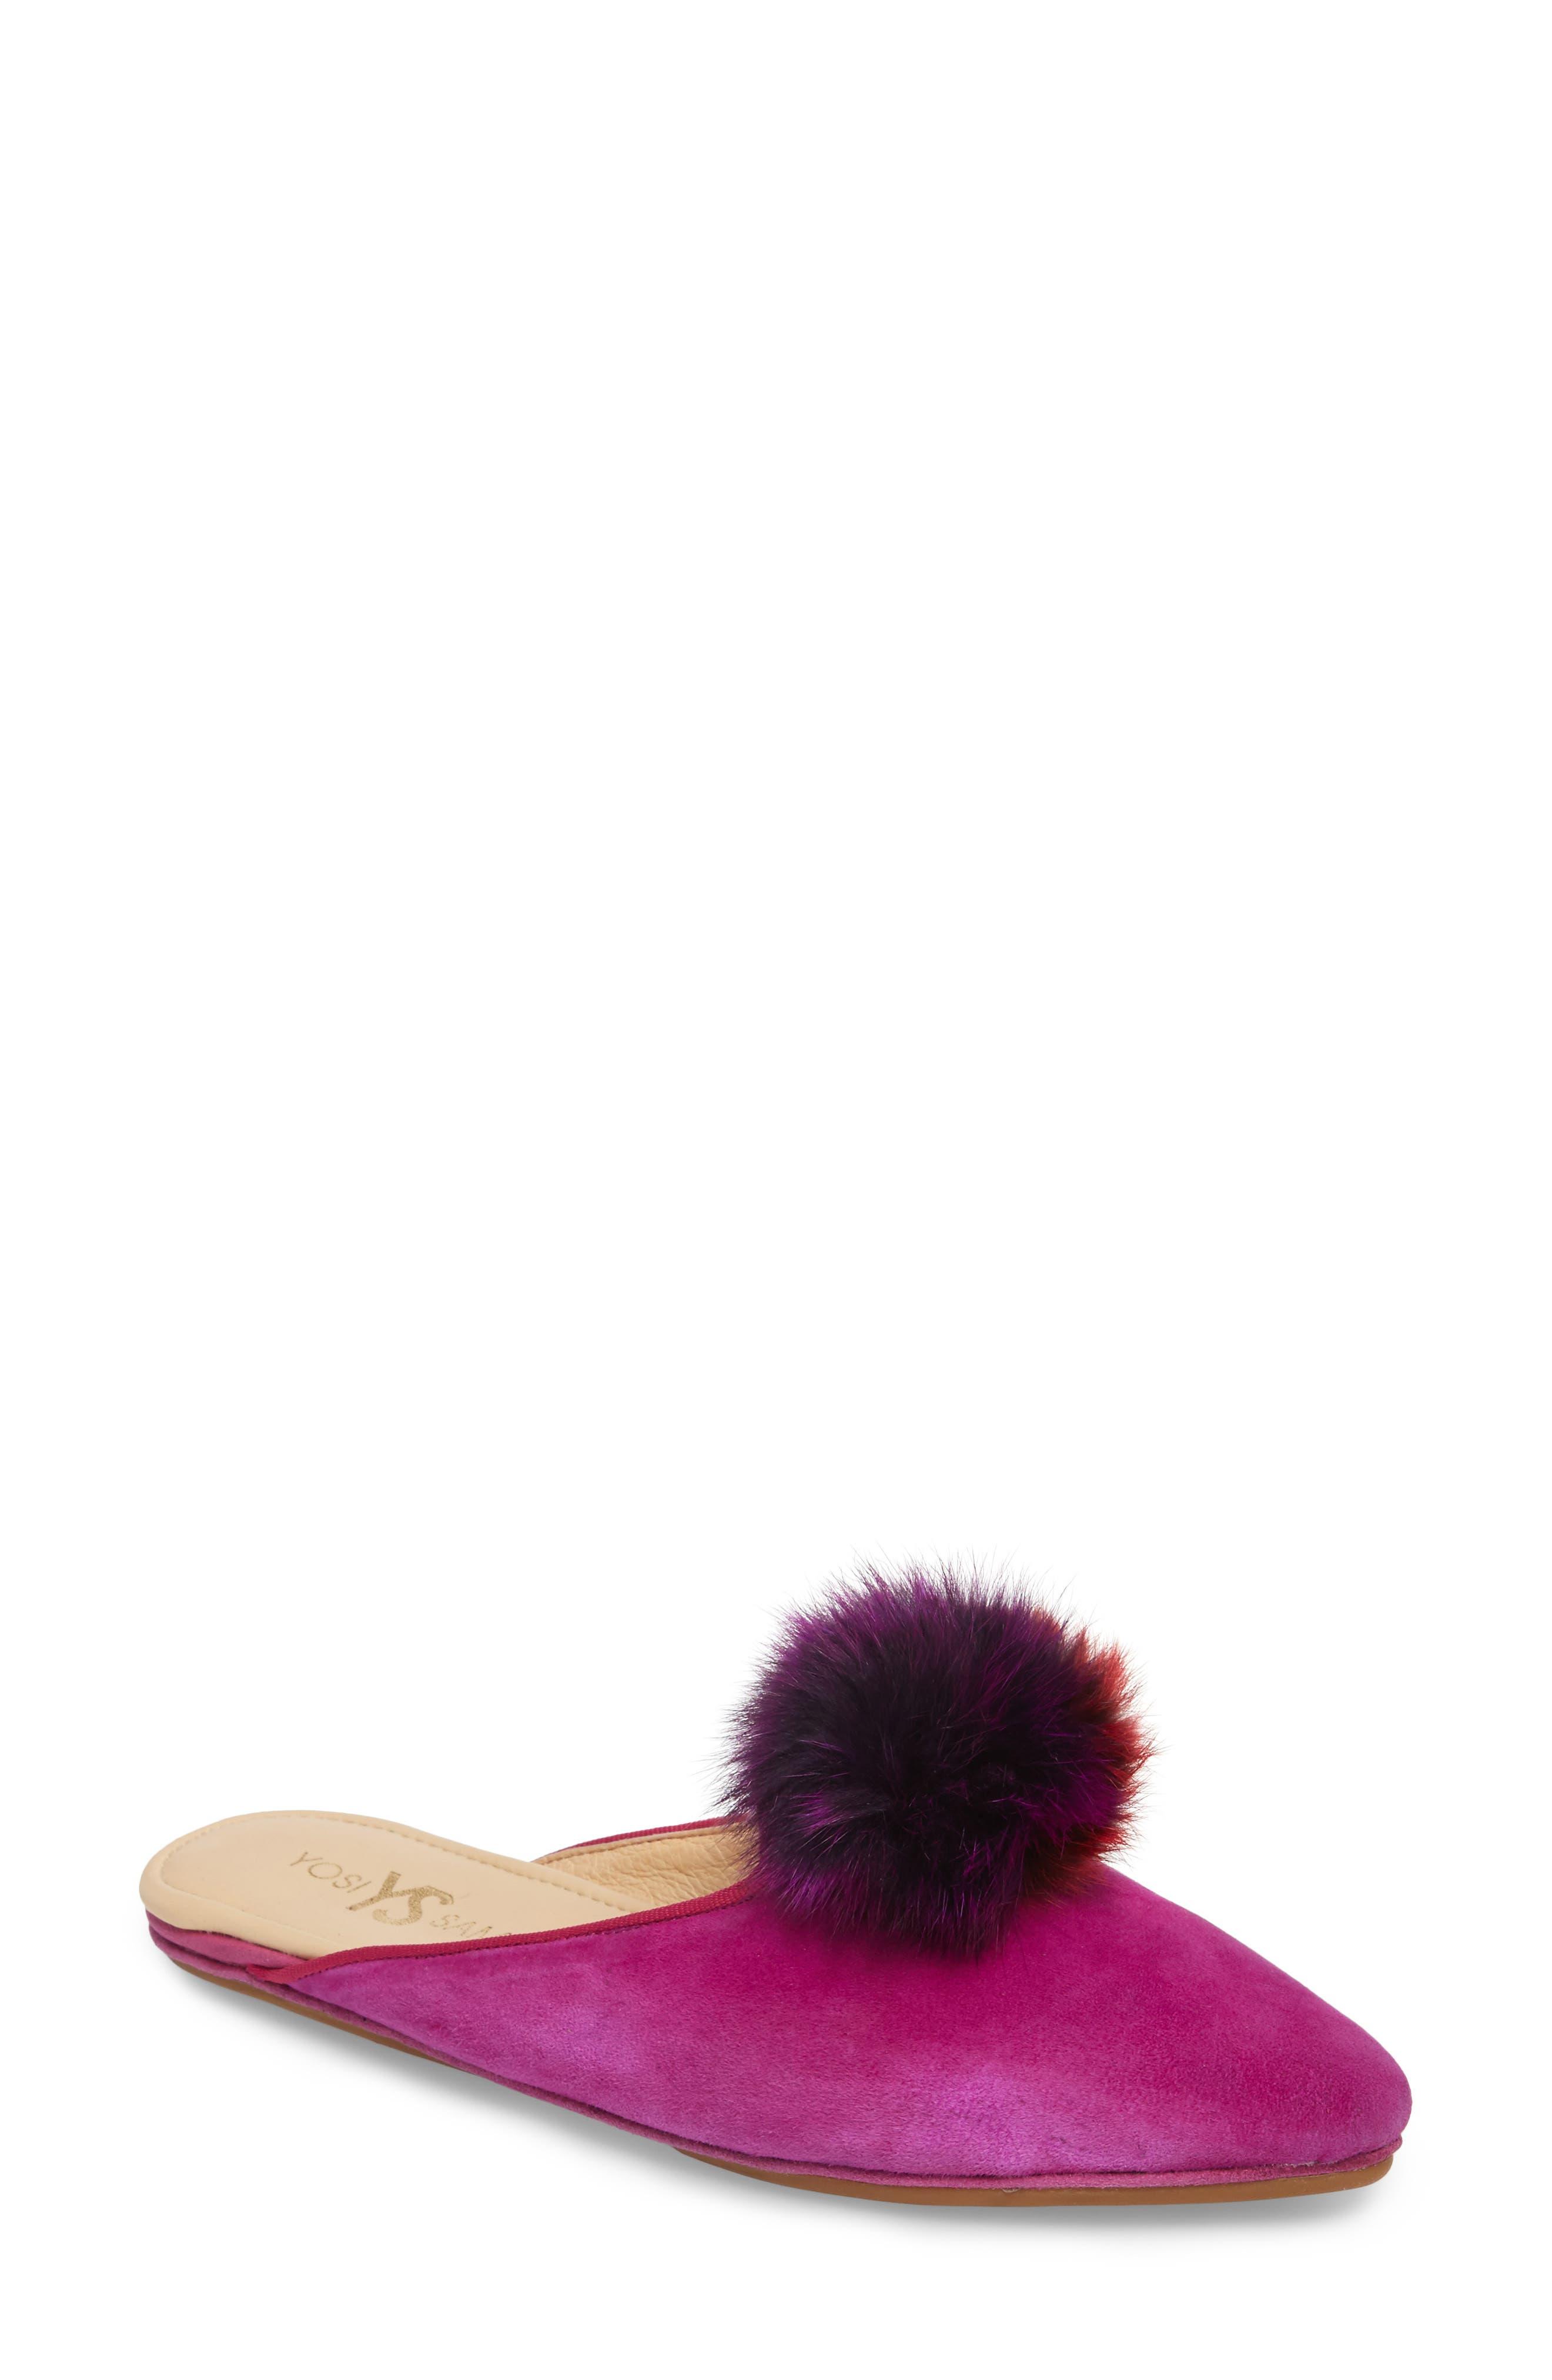 Yosi Samra Women's Vidi Genuine Rabbit Fur Loafer Mule 6lfnVC5D